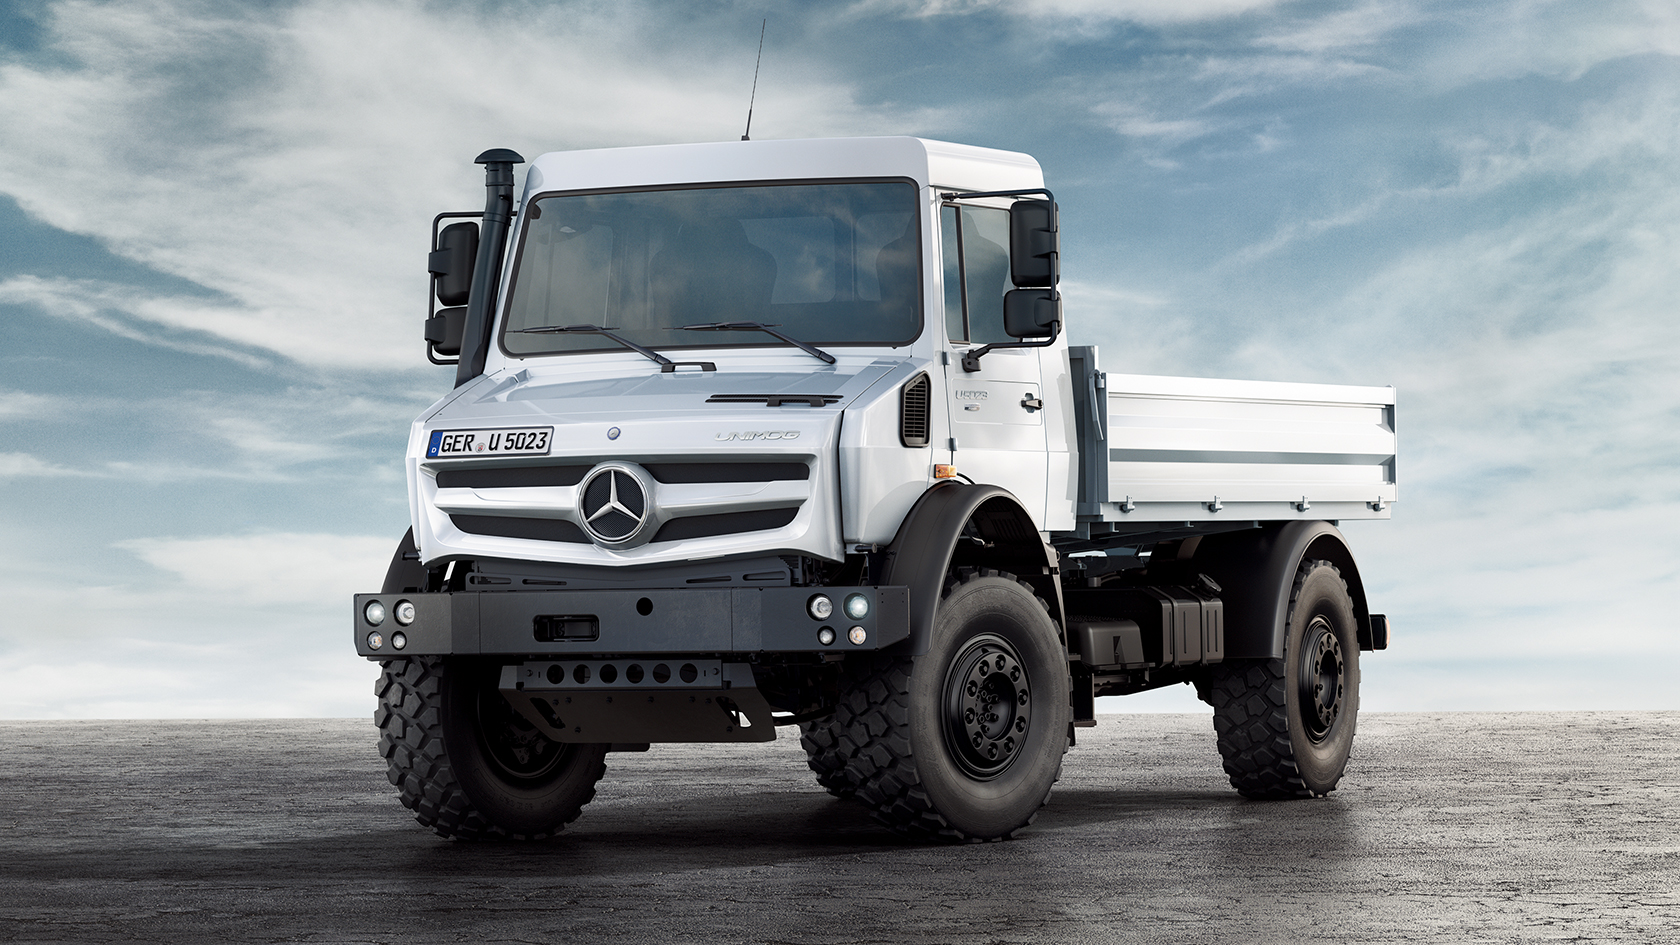 Unimog U 4023/U 5023 - Mercedes-Benz Trucks - Trucks you ...